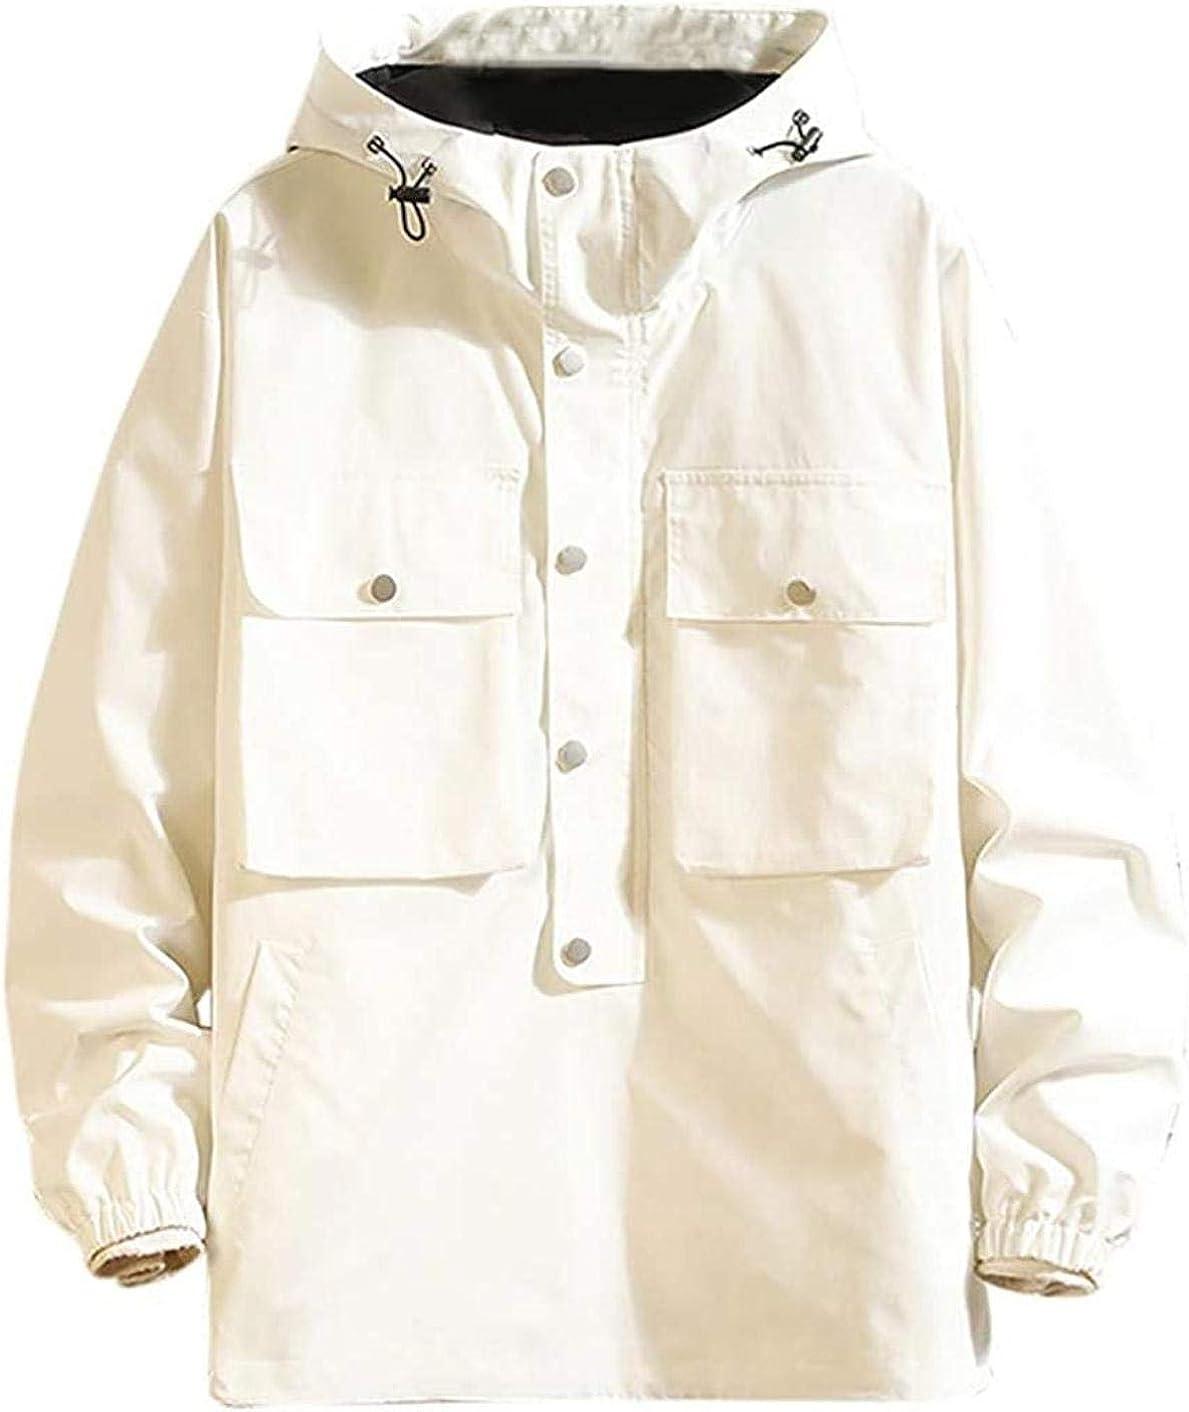 Men's Pullover Zipper Hoodies Jacket Sale price Coat Autum Super beauty product restock quality top for Pocket Multi